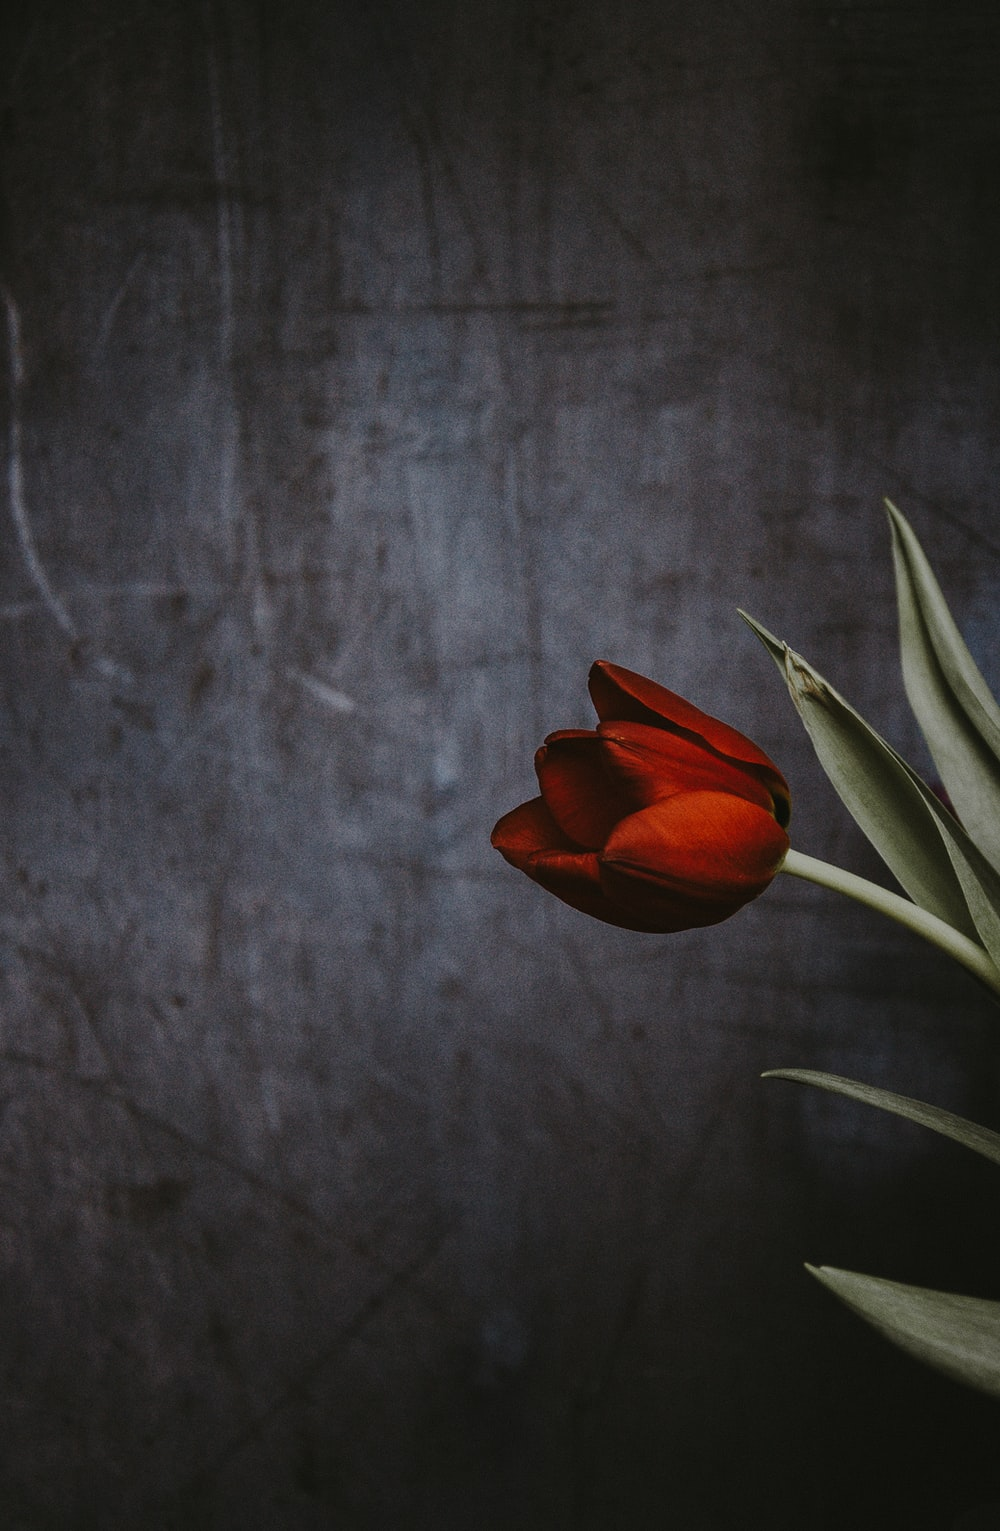 closeup photo of red tulip flower